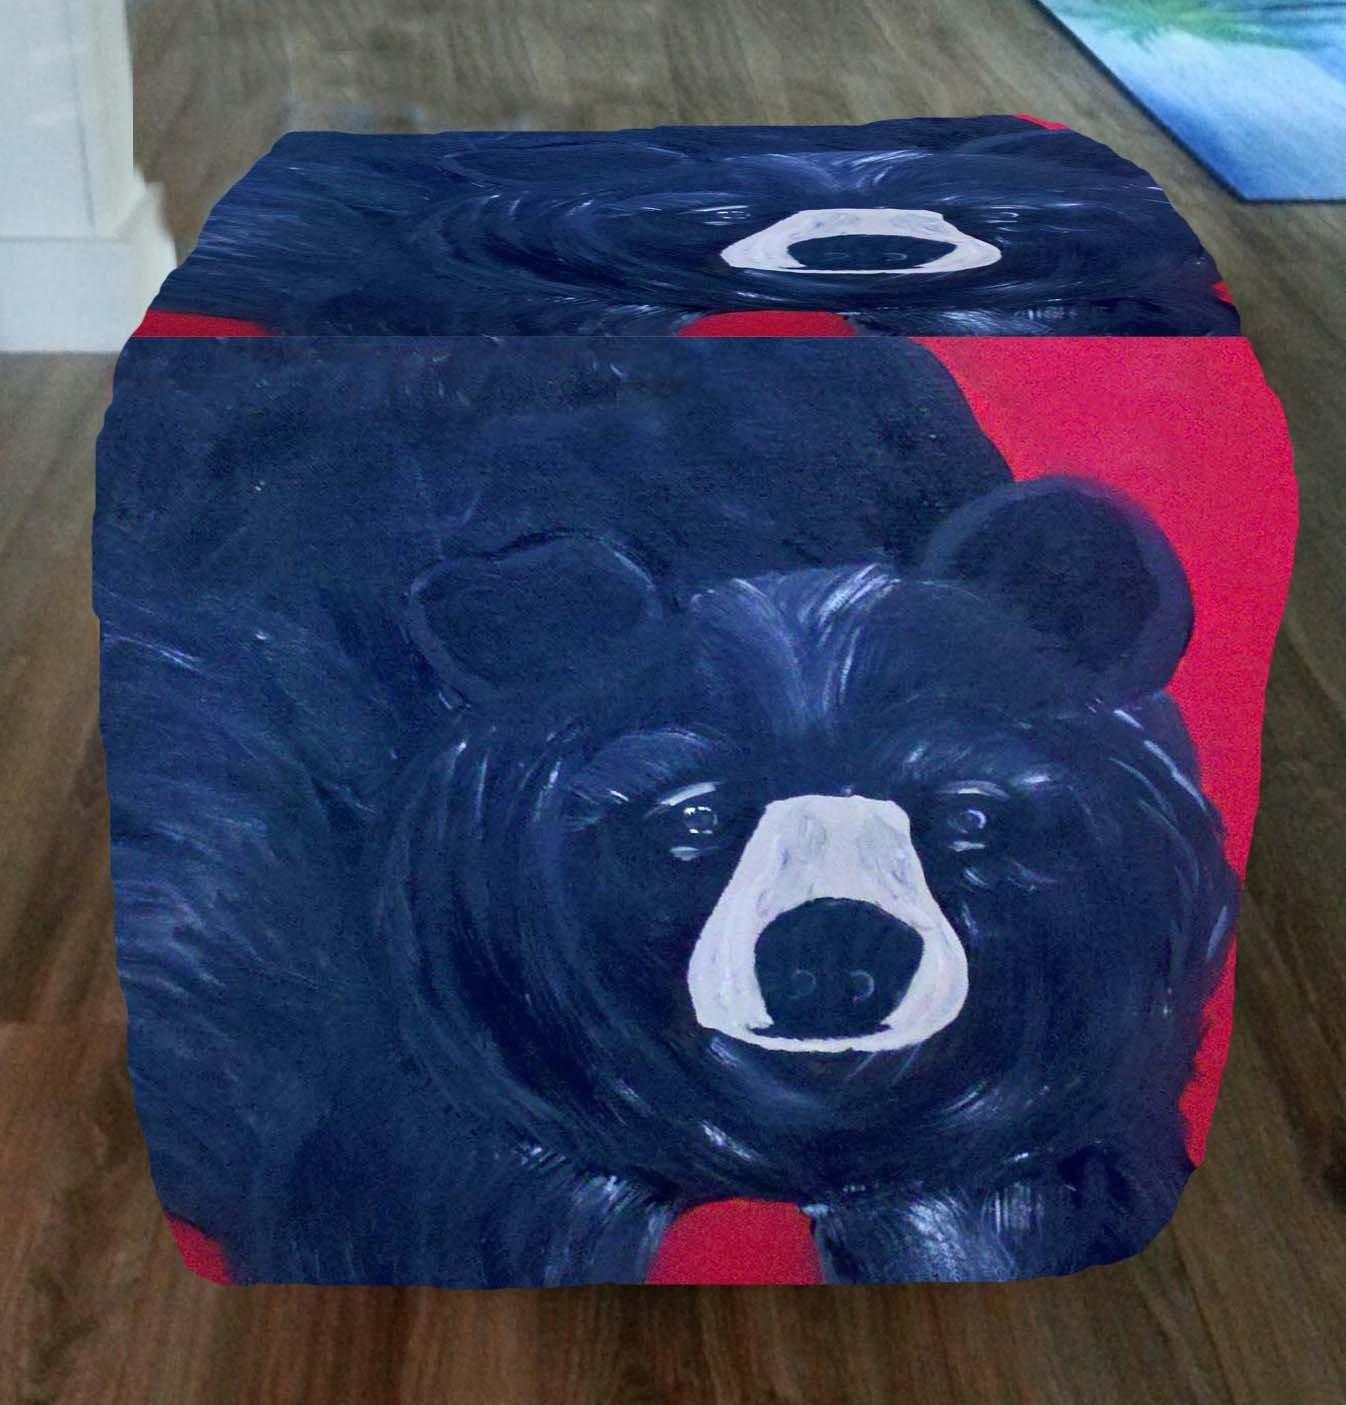 Black Bear Ottoman From My Art